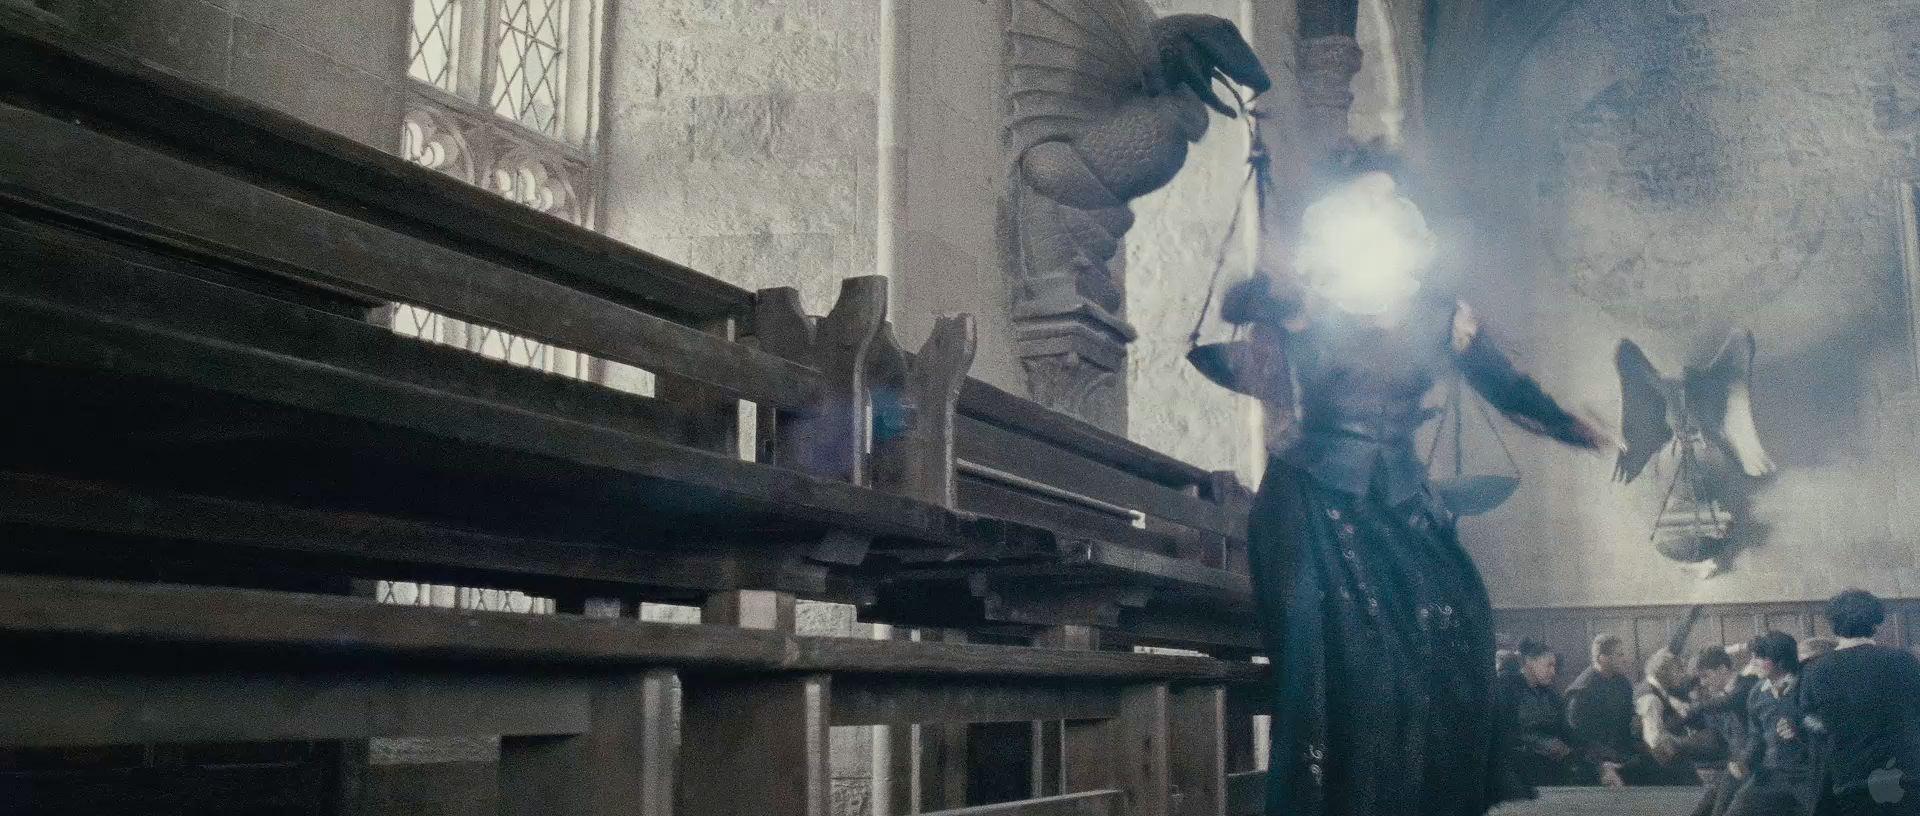 Harry Potter BlogHogwarts HP7 2 Trailer 79